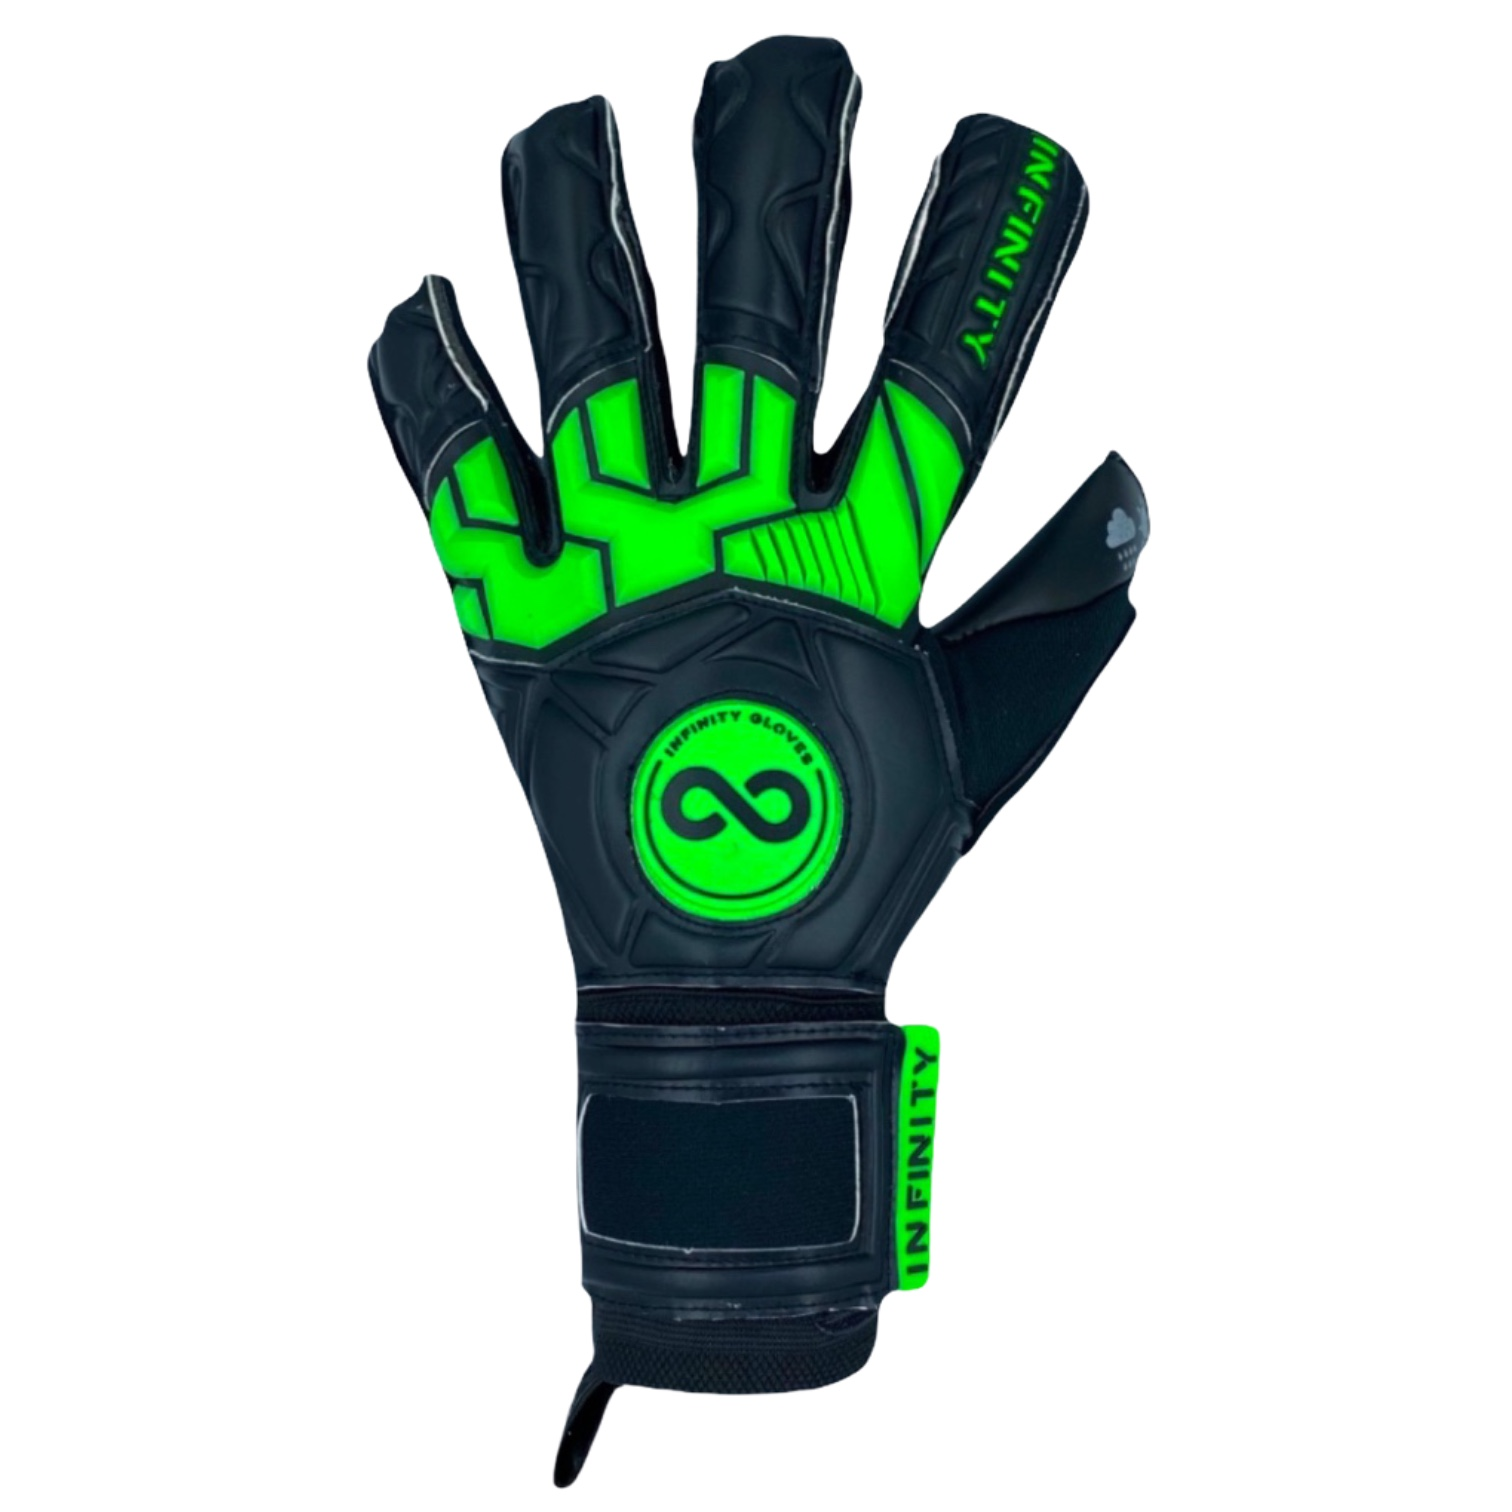 Luva Goleiro Profissional Infinity Pro Max Green